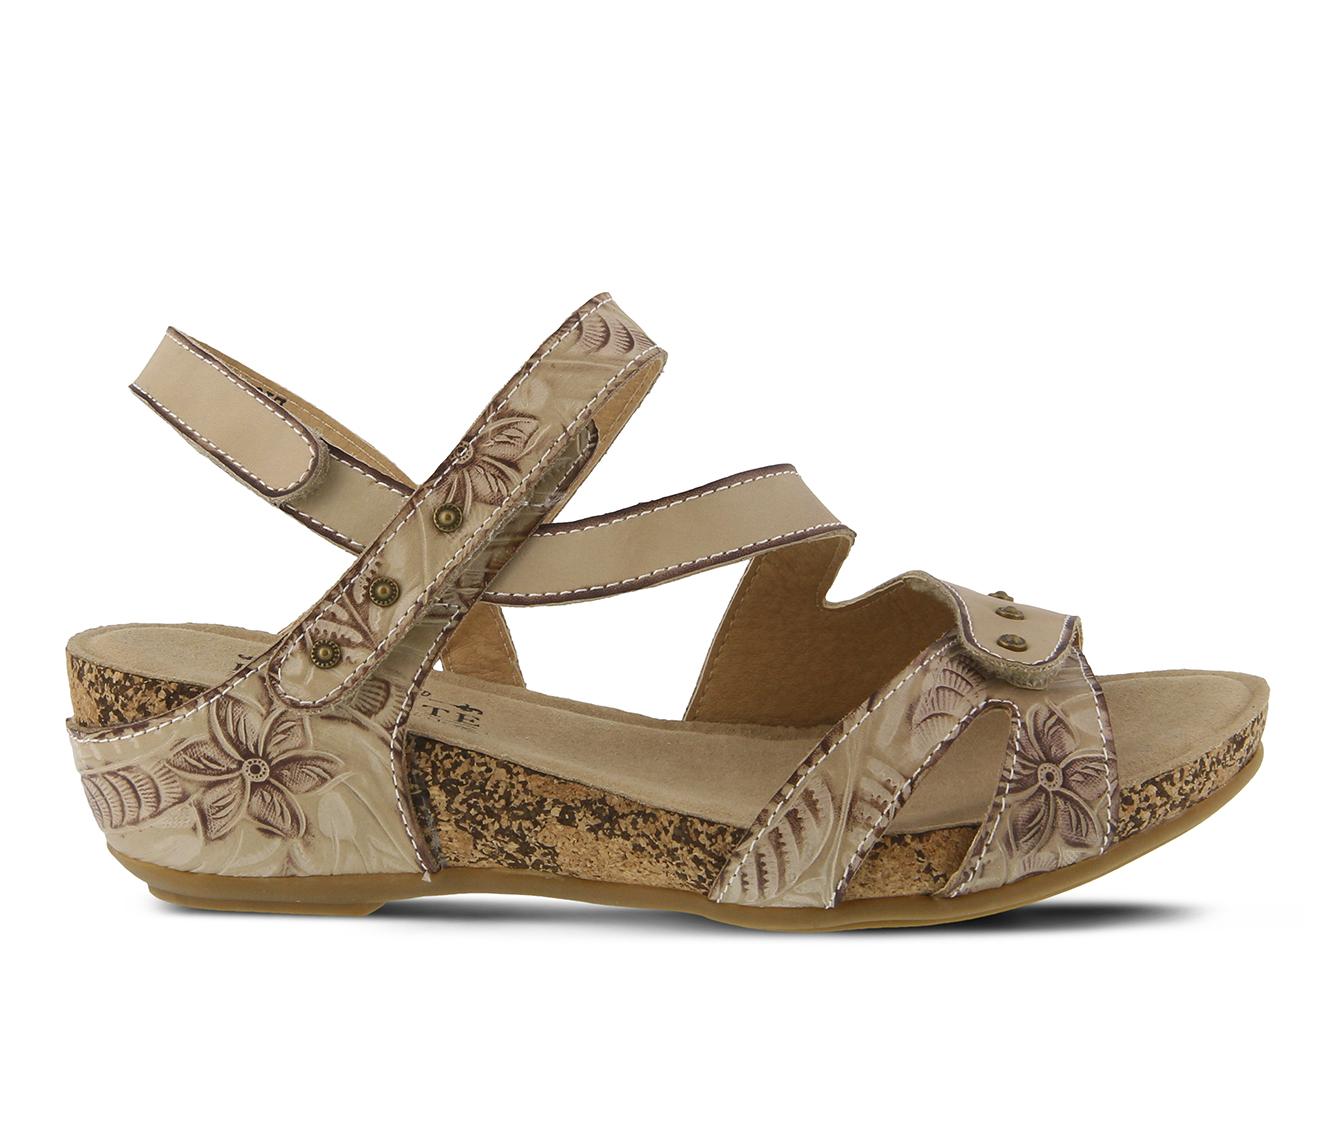 L'Artiste Quilana Women's Sandal (Beige Leather)